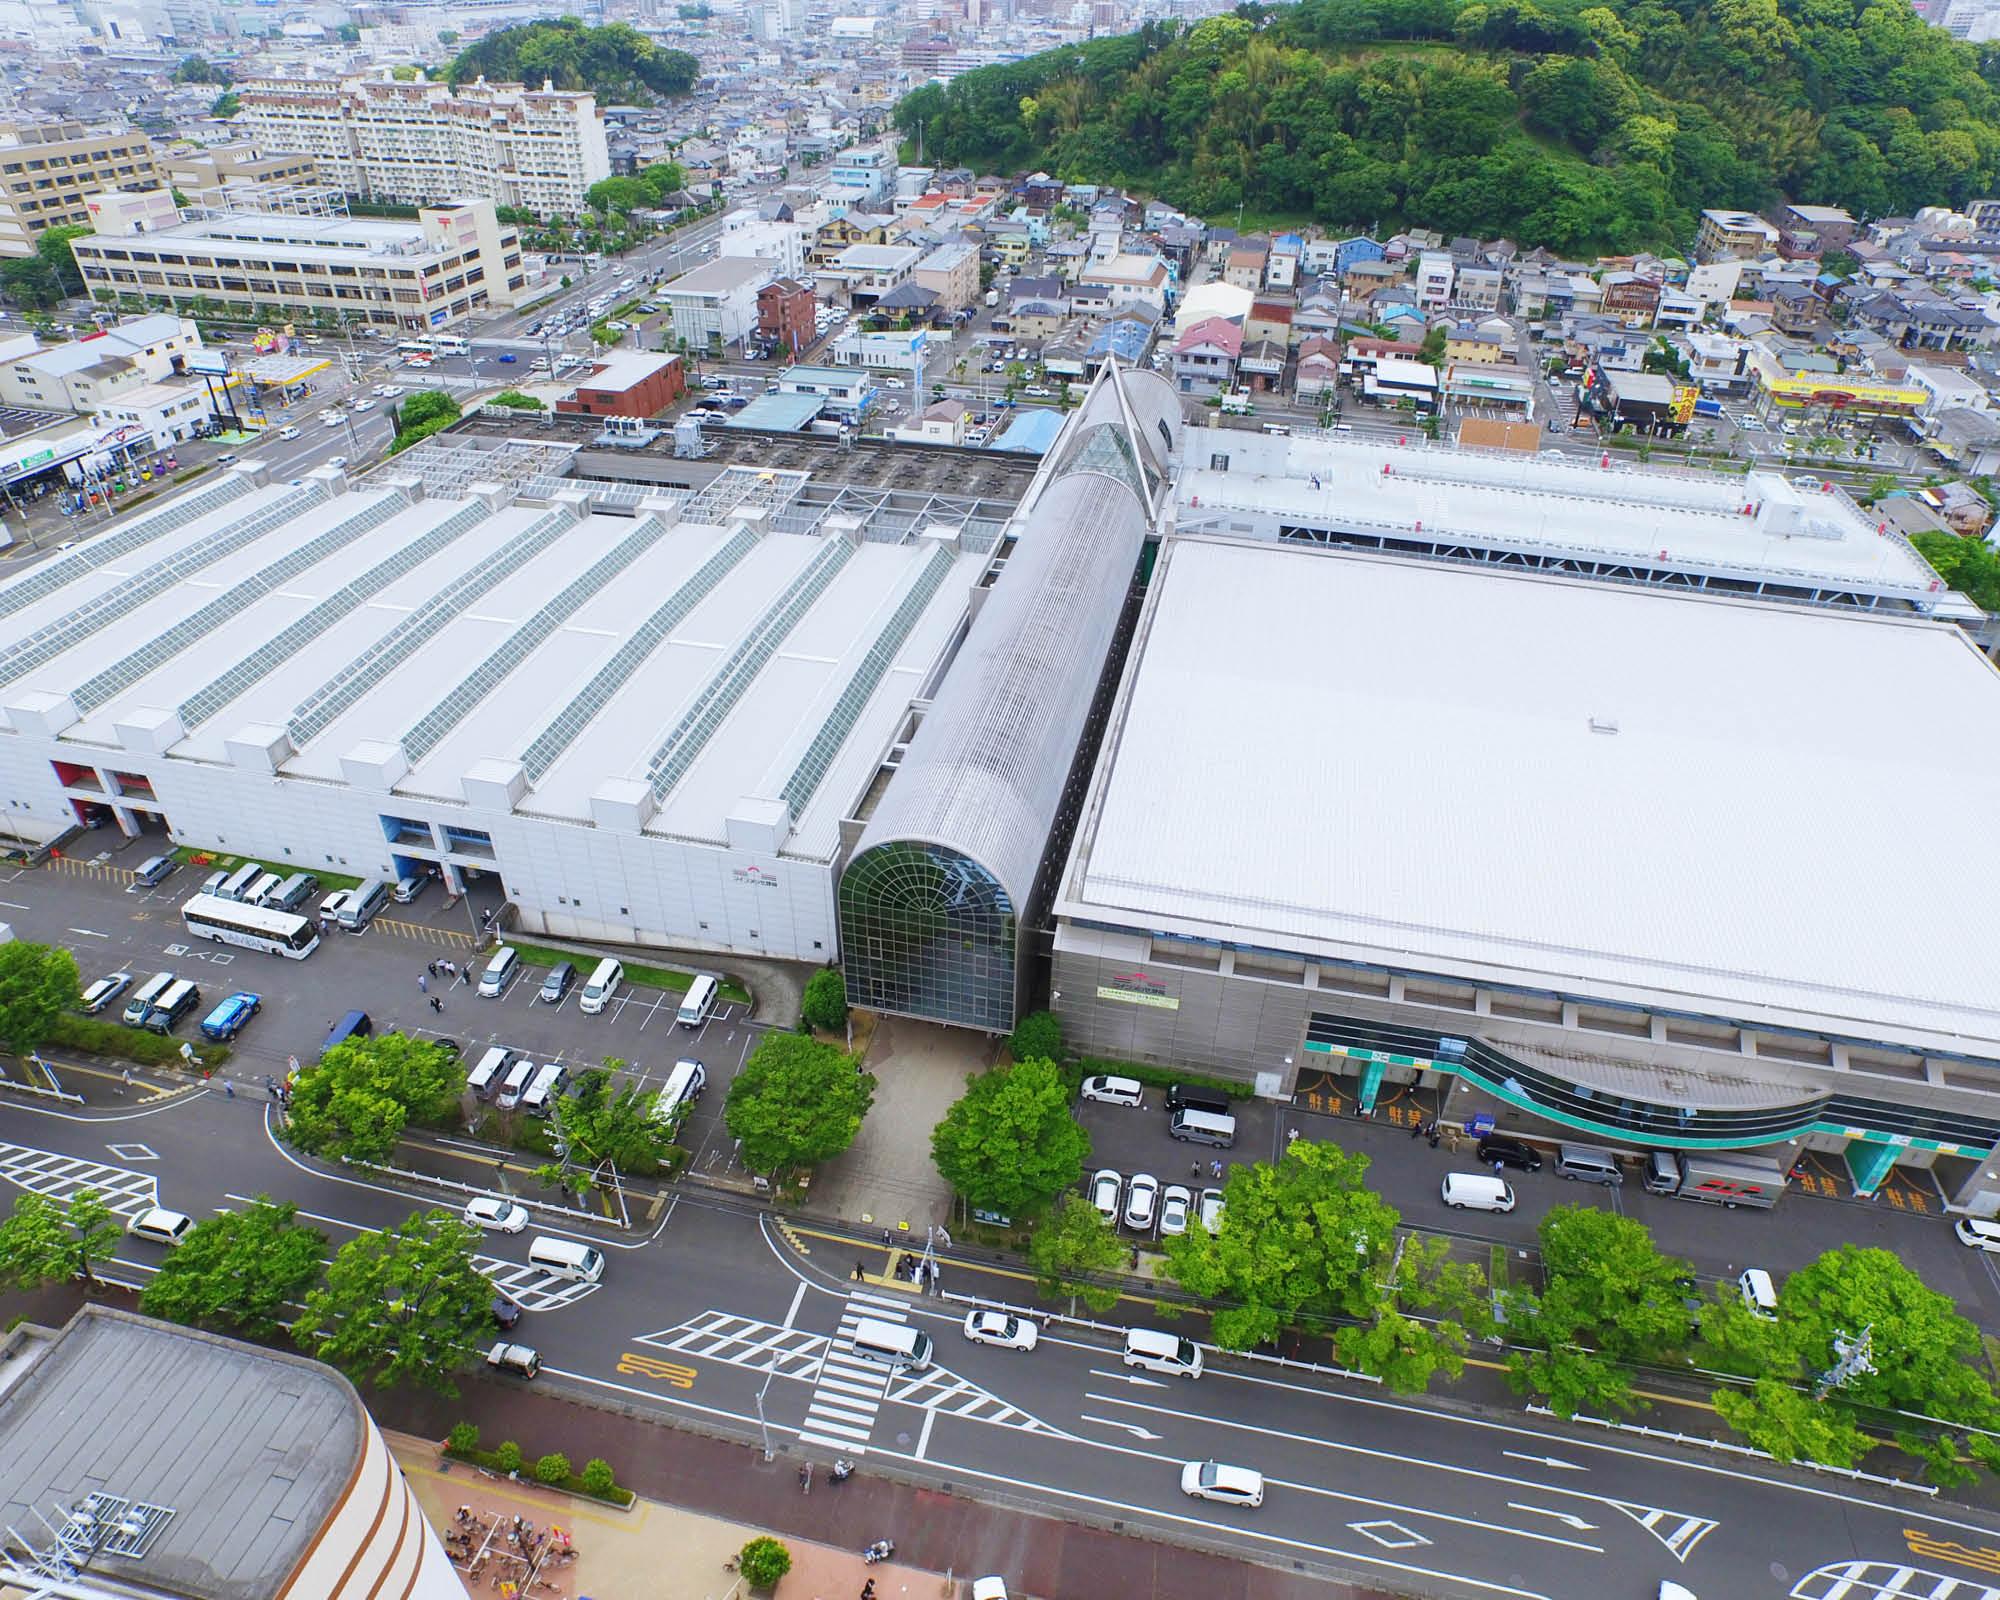 https://www.shizuoka-cb.com/wp-content/uploads/2021/03/photo-top11.jpg